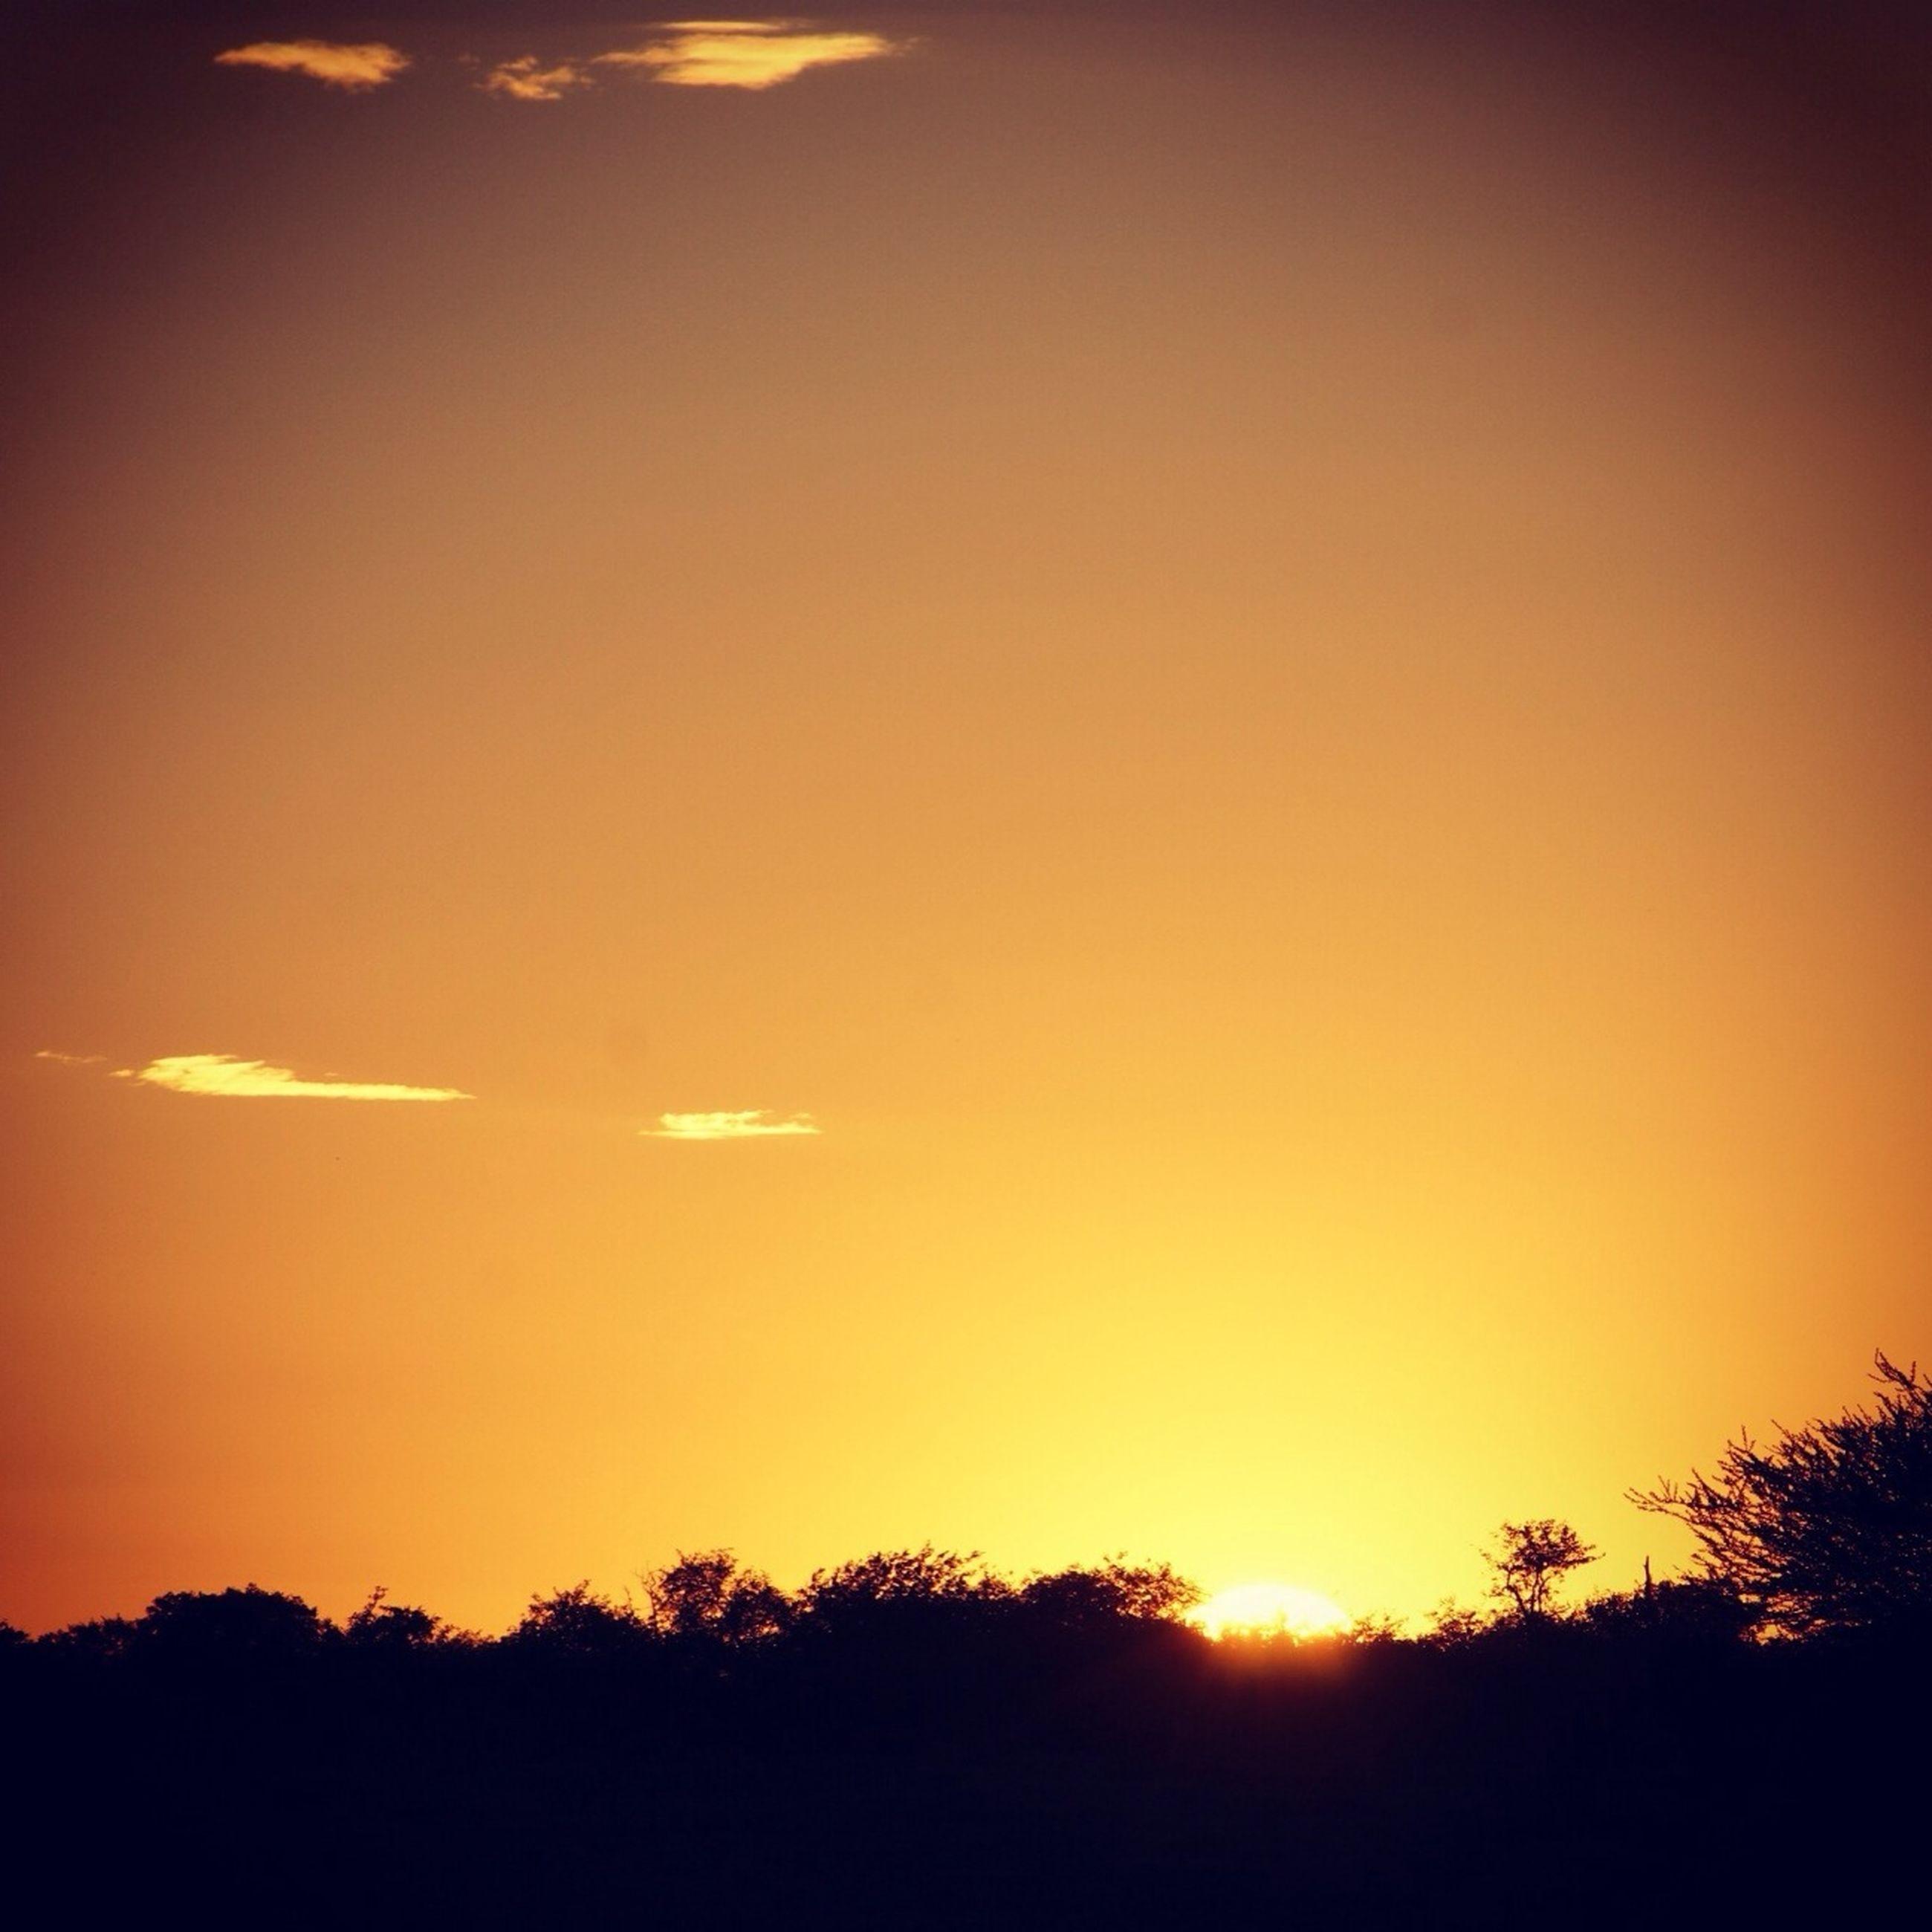 sunset, silhouette, sun, orange color, scenics, beauty in nature, tranquil scene, tranquility, idyllic, tree, nature, sky, sunlight, landscape, copy space, clear sky, outdoors, no people, majestic, dark